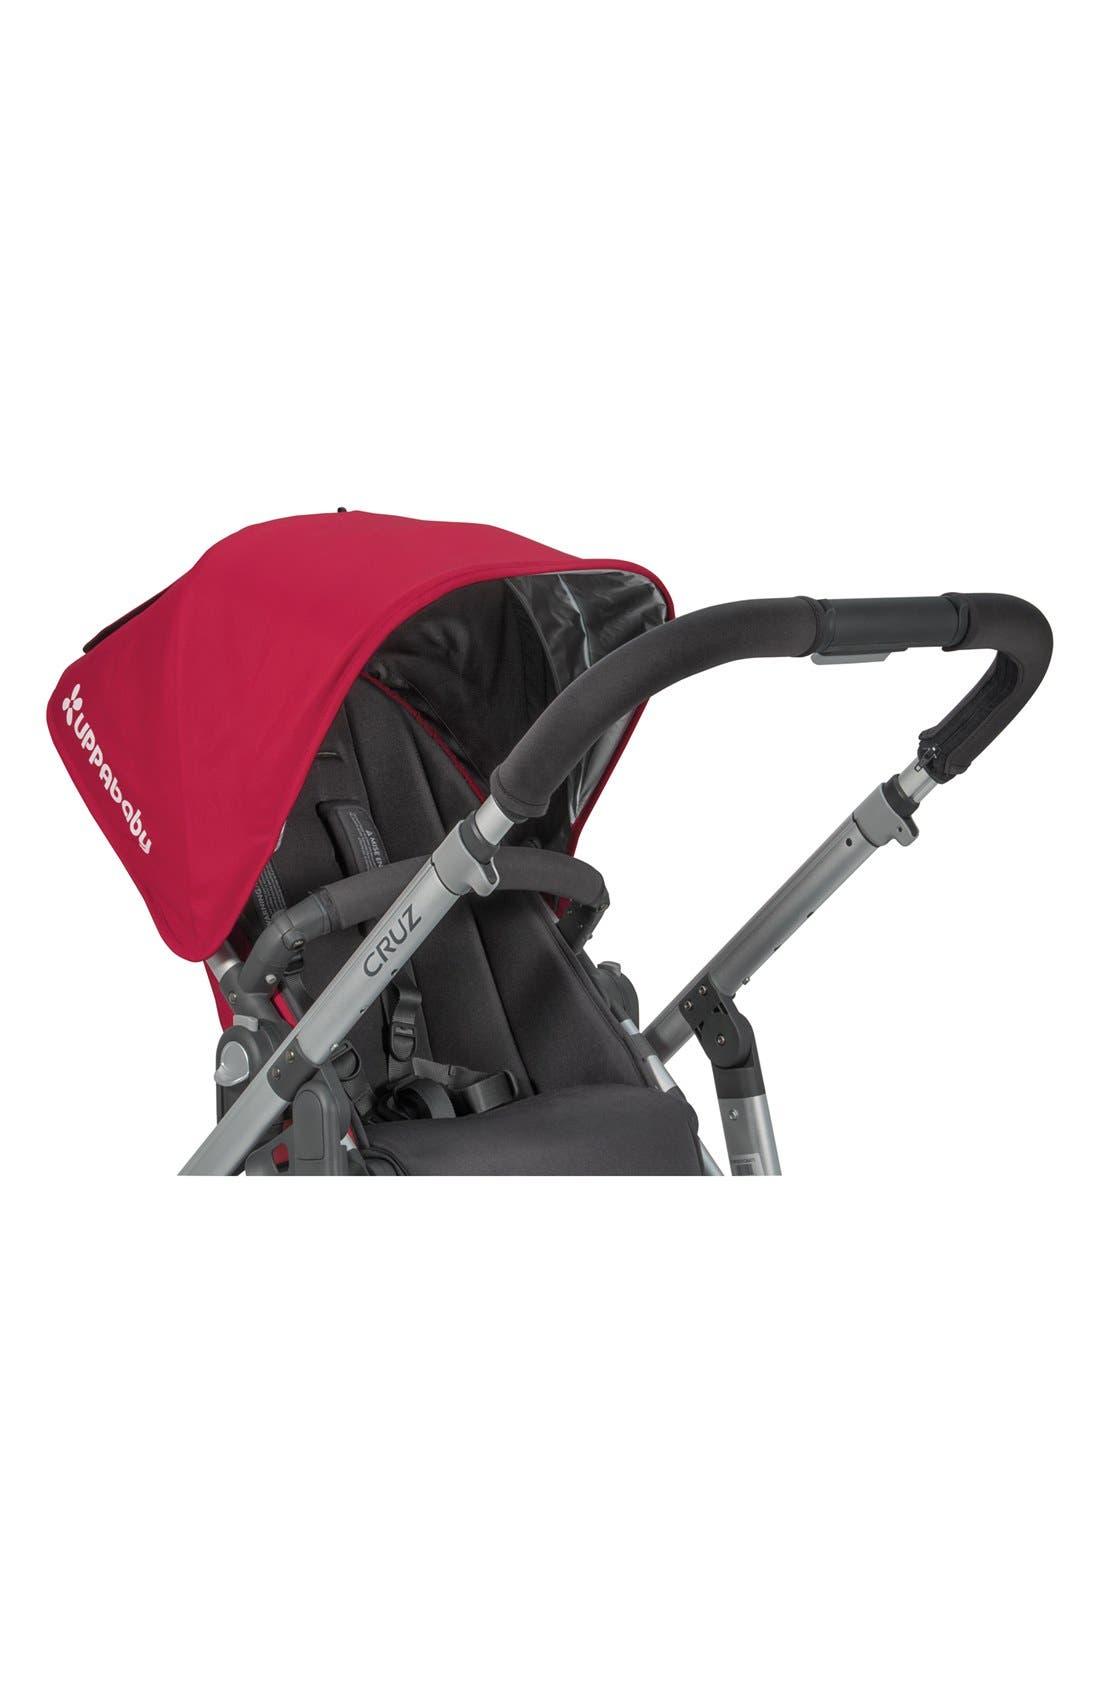 Main Image - UPPAbaby CRUZ Stroller Handlebar Cover